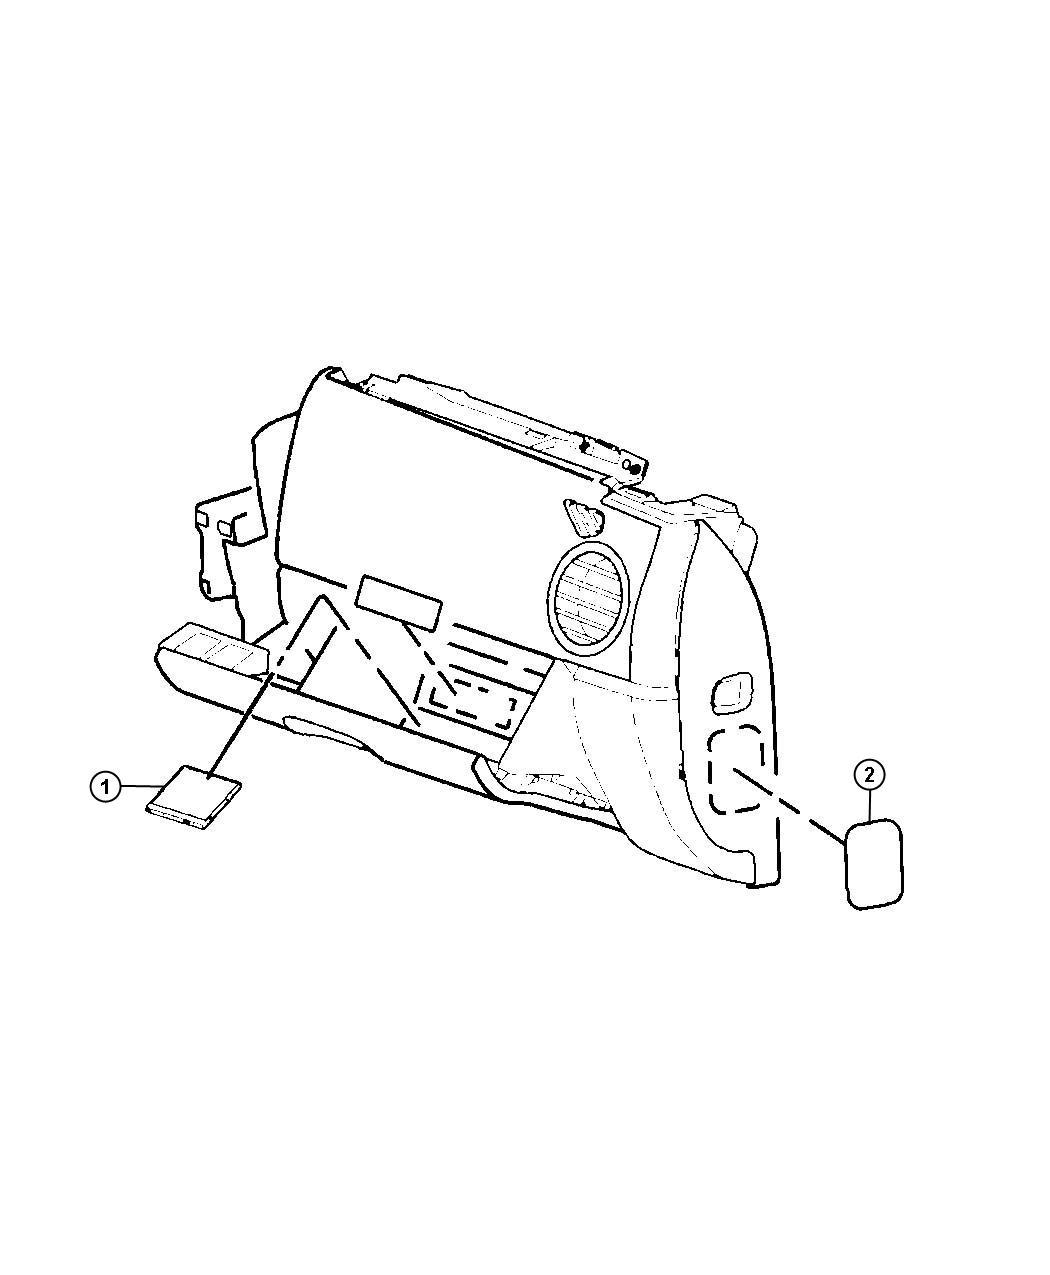 Jeep Wrangler Label. Air bag, air bag warning. Glove box